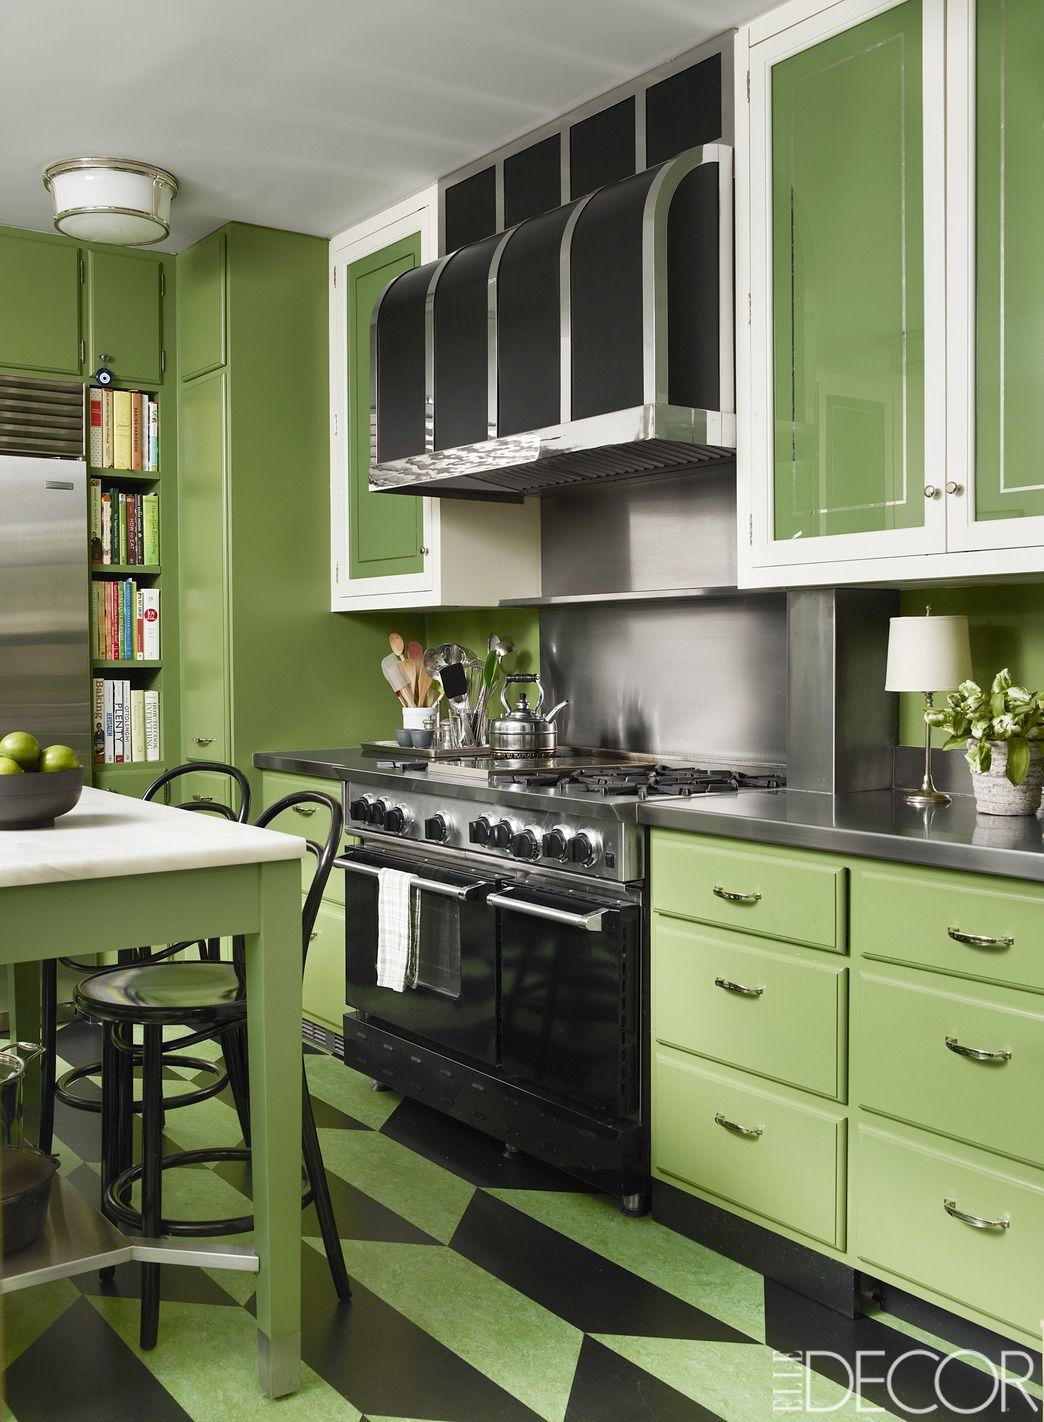 apple green kitchen cabinets with wood layjao kitchen remodel small green kitchen designs on kitchen interior green id=61261